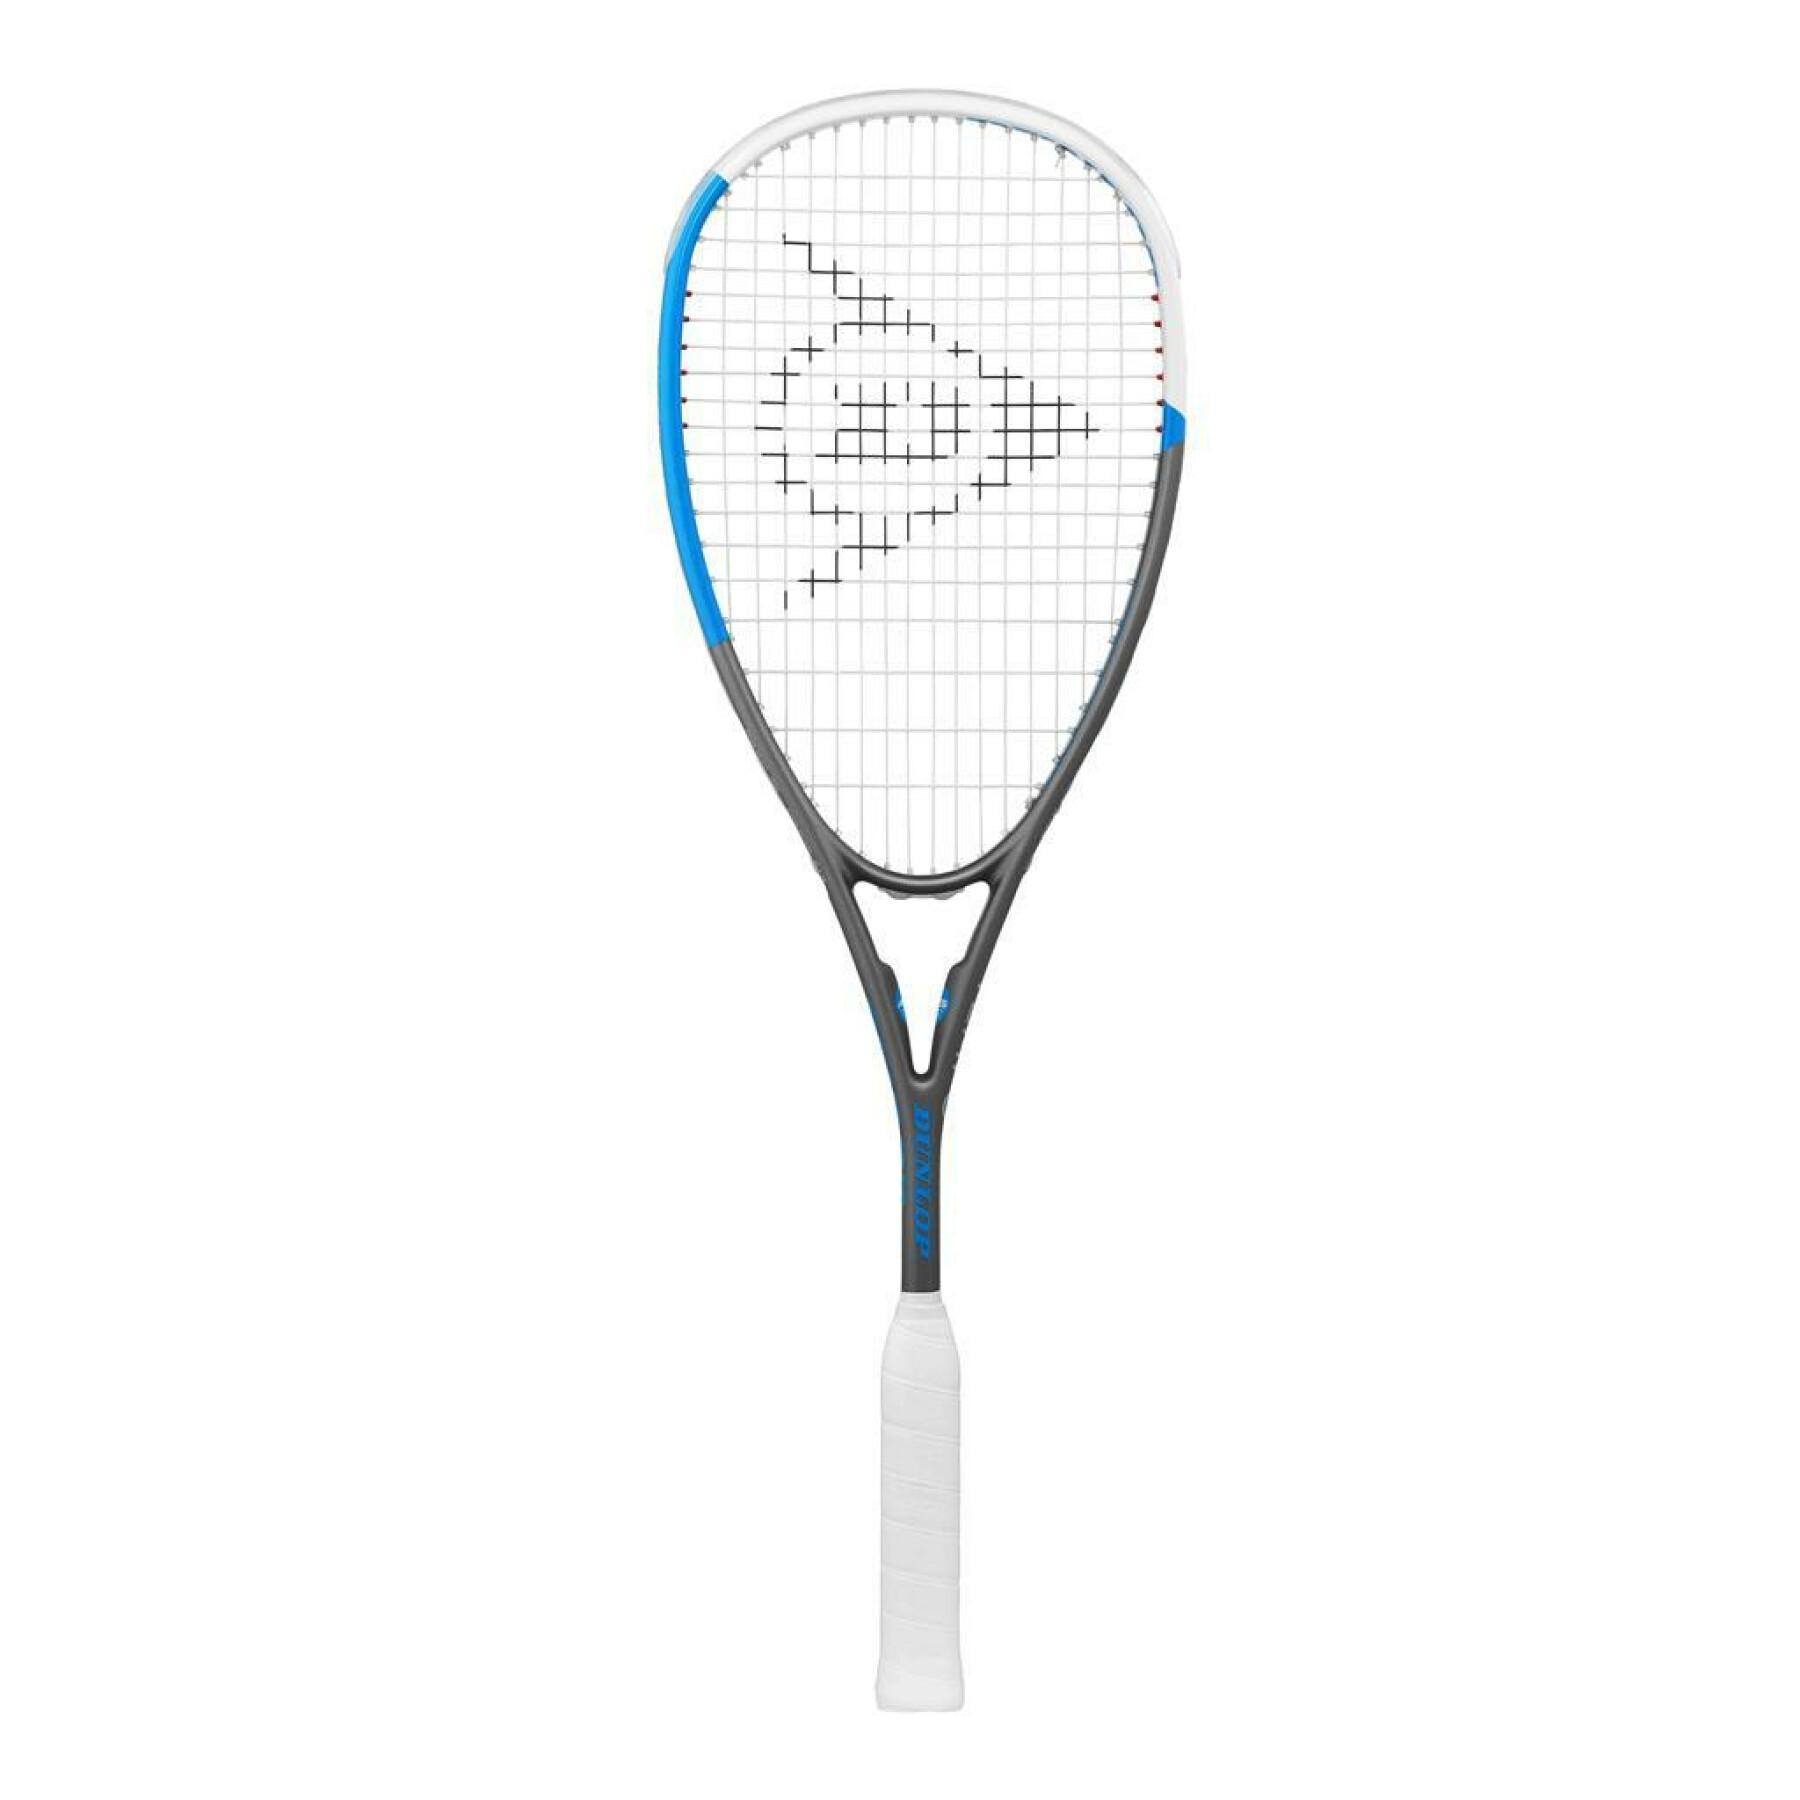 Racket Dunlop tempo elite 4.0